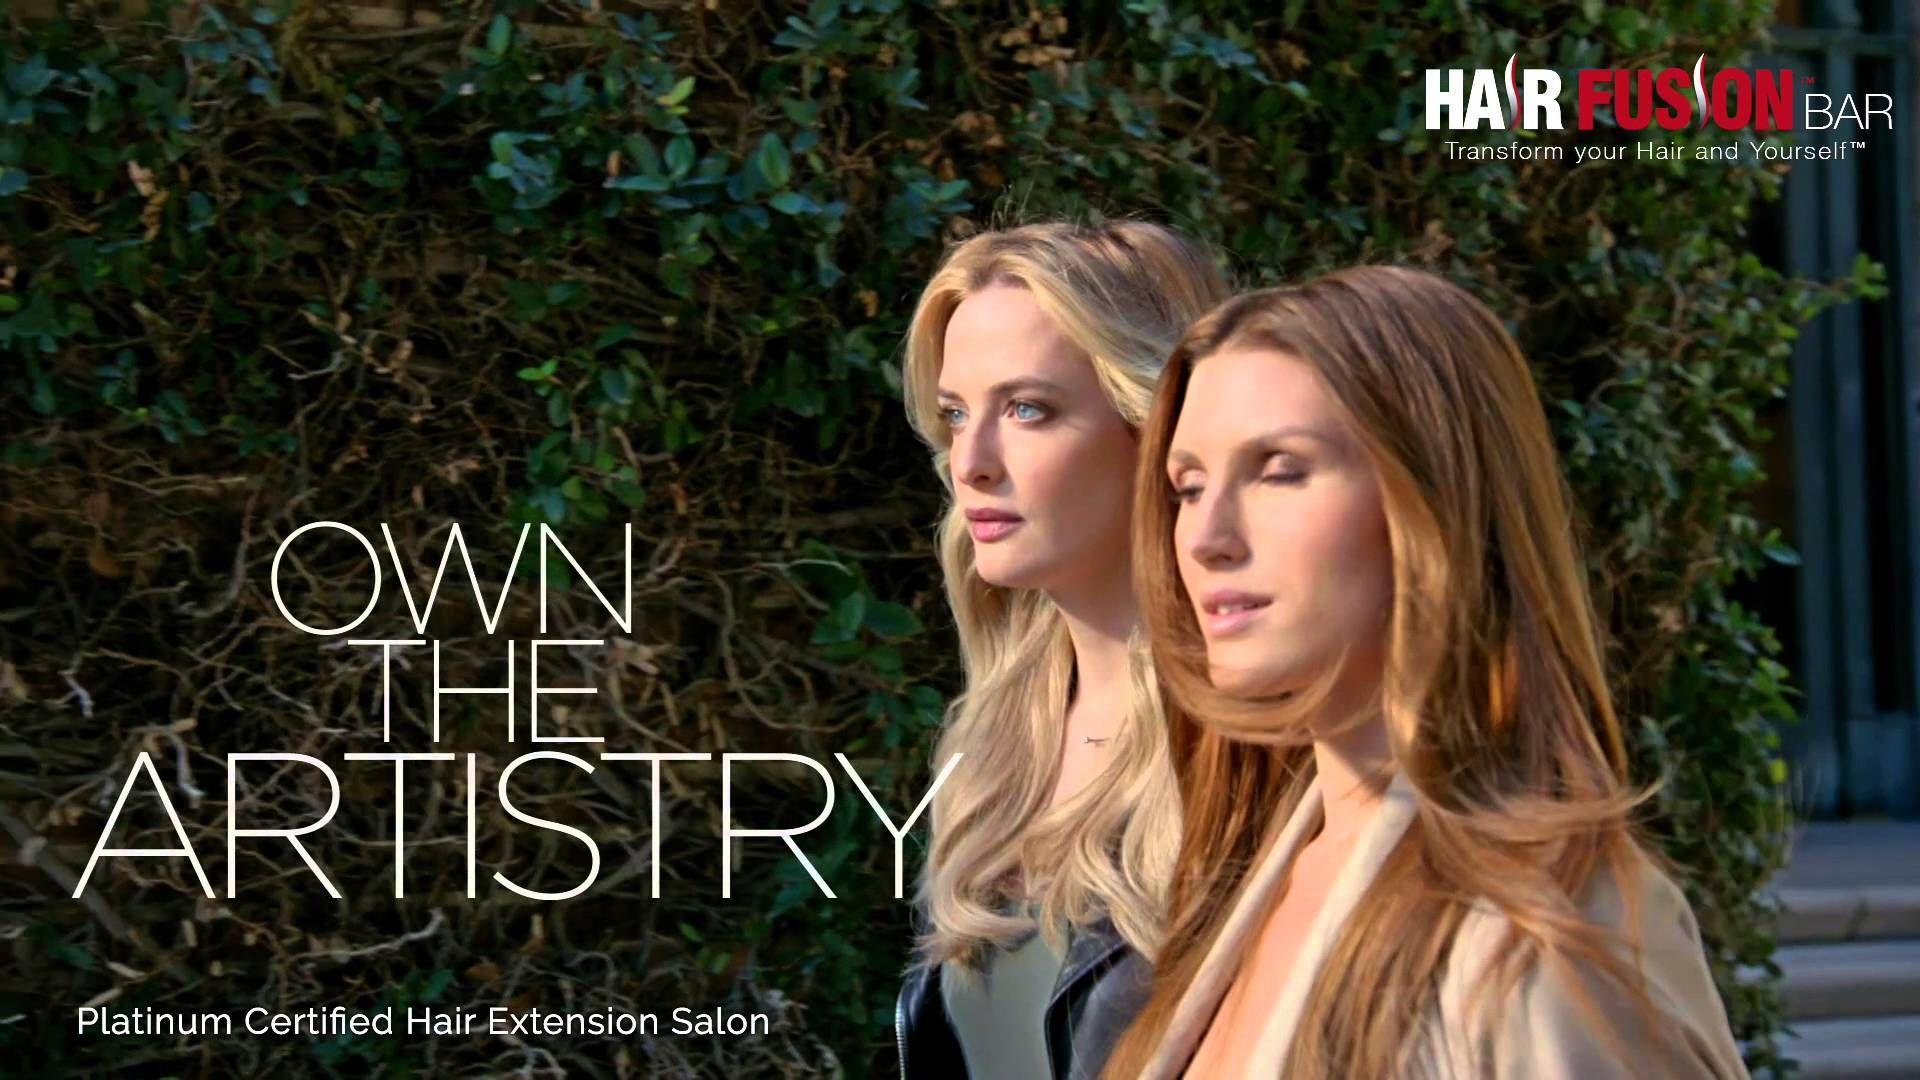 Hair Fusion Bar 2016 Tv Commercial Great Lengths Platinum Hair